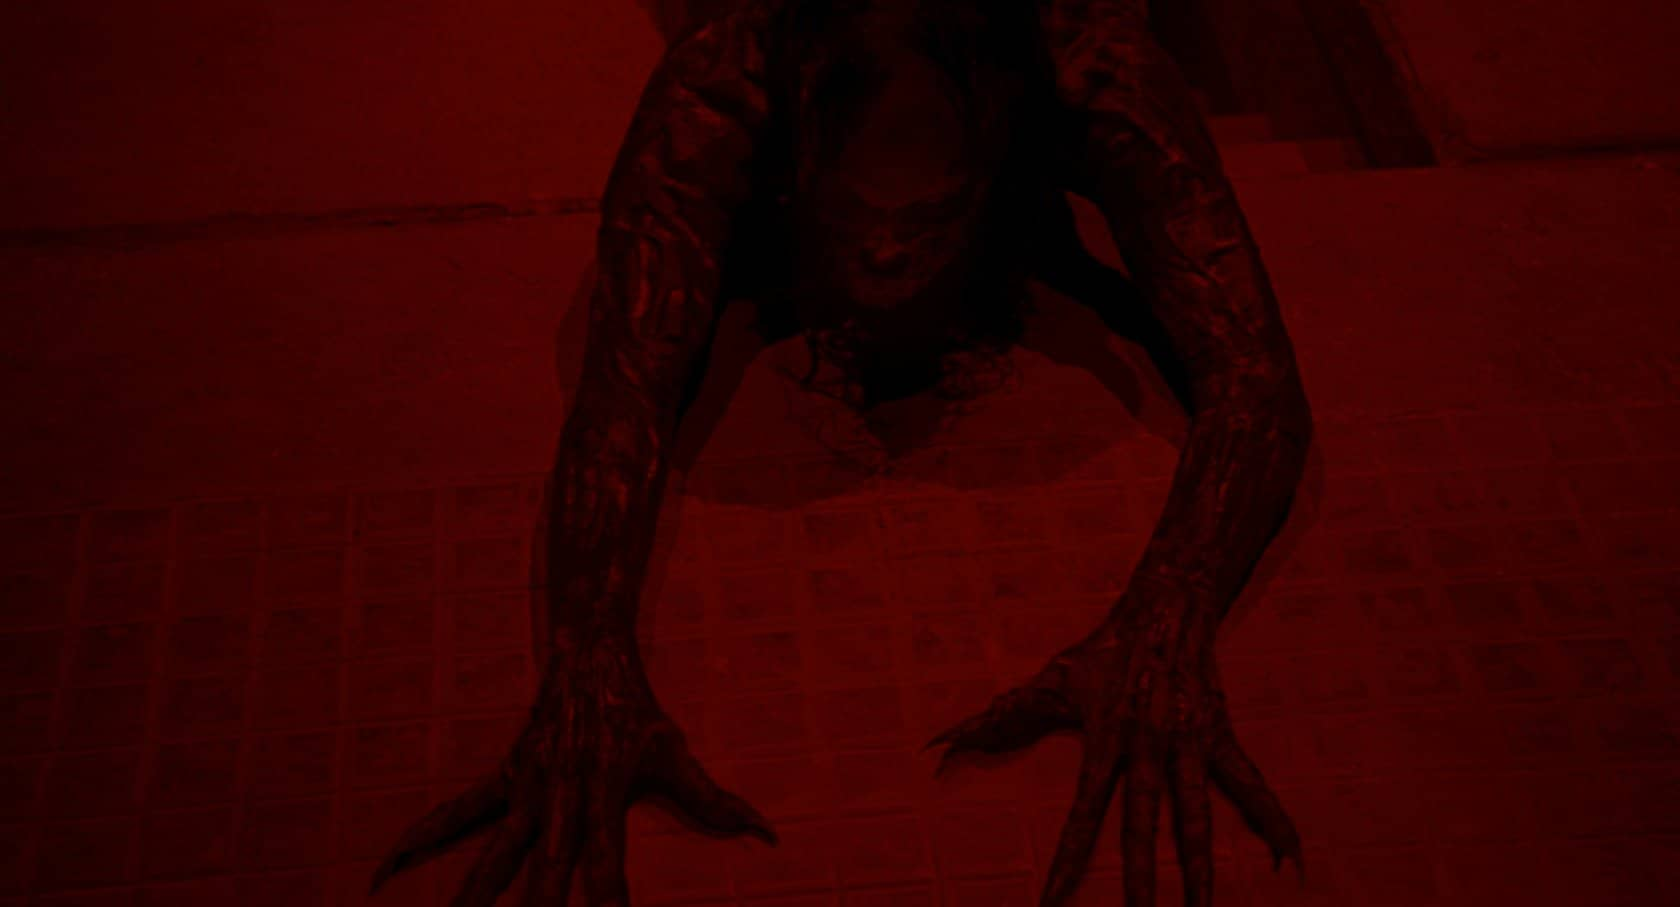 suspiria-2018-red.jpg